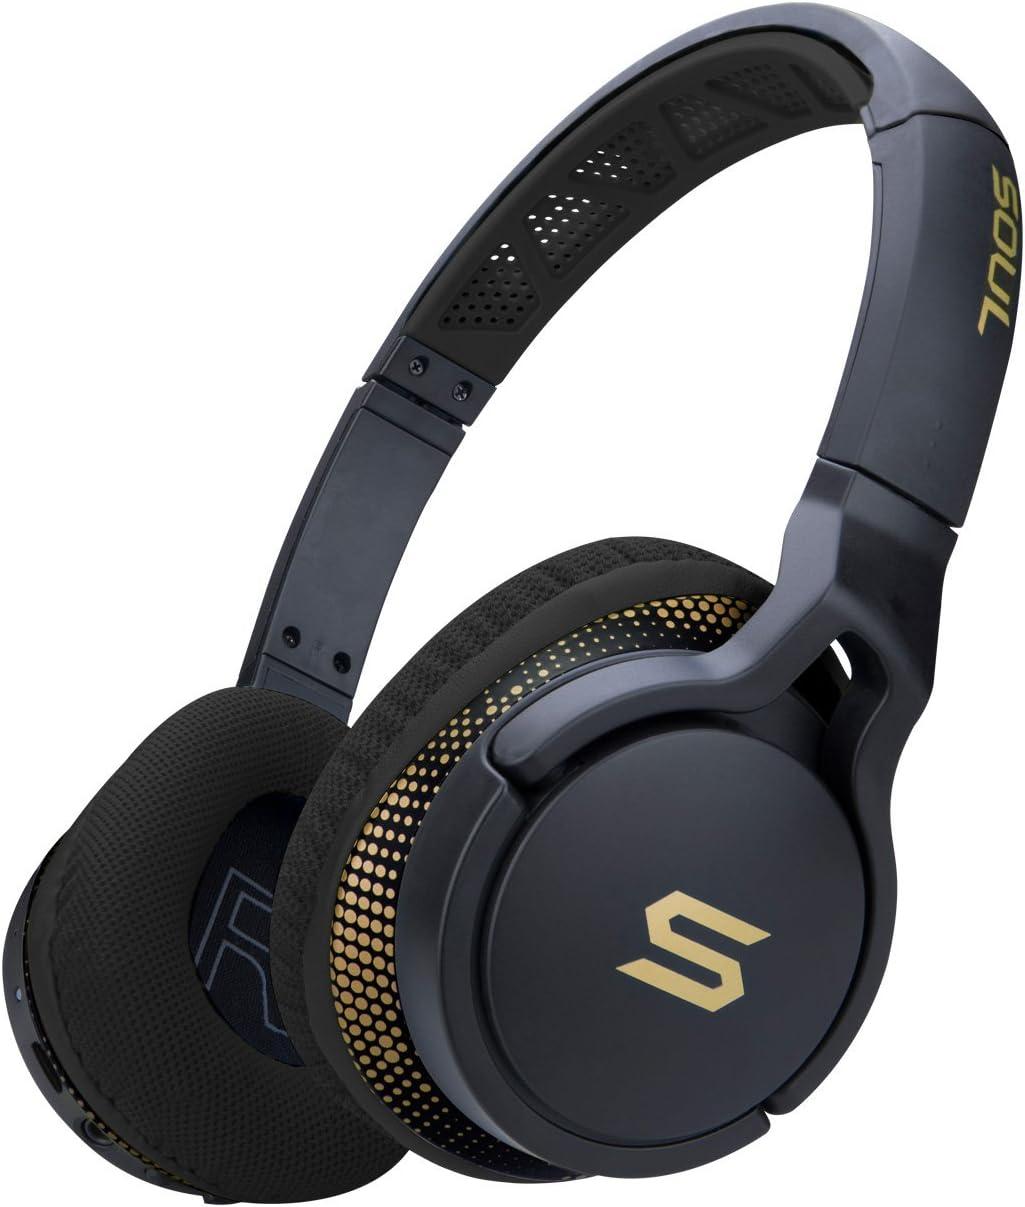 Bluetooth Headphones, Soul Electronics Transform Wireless Sport Headset Active Performance On-Ear Sports Earphones for Running Gym Workout Jogging - Storm Black